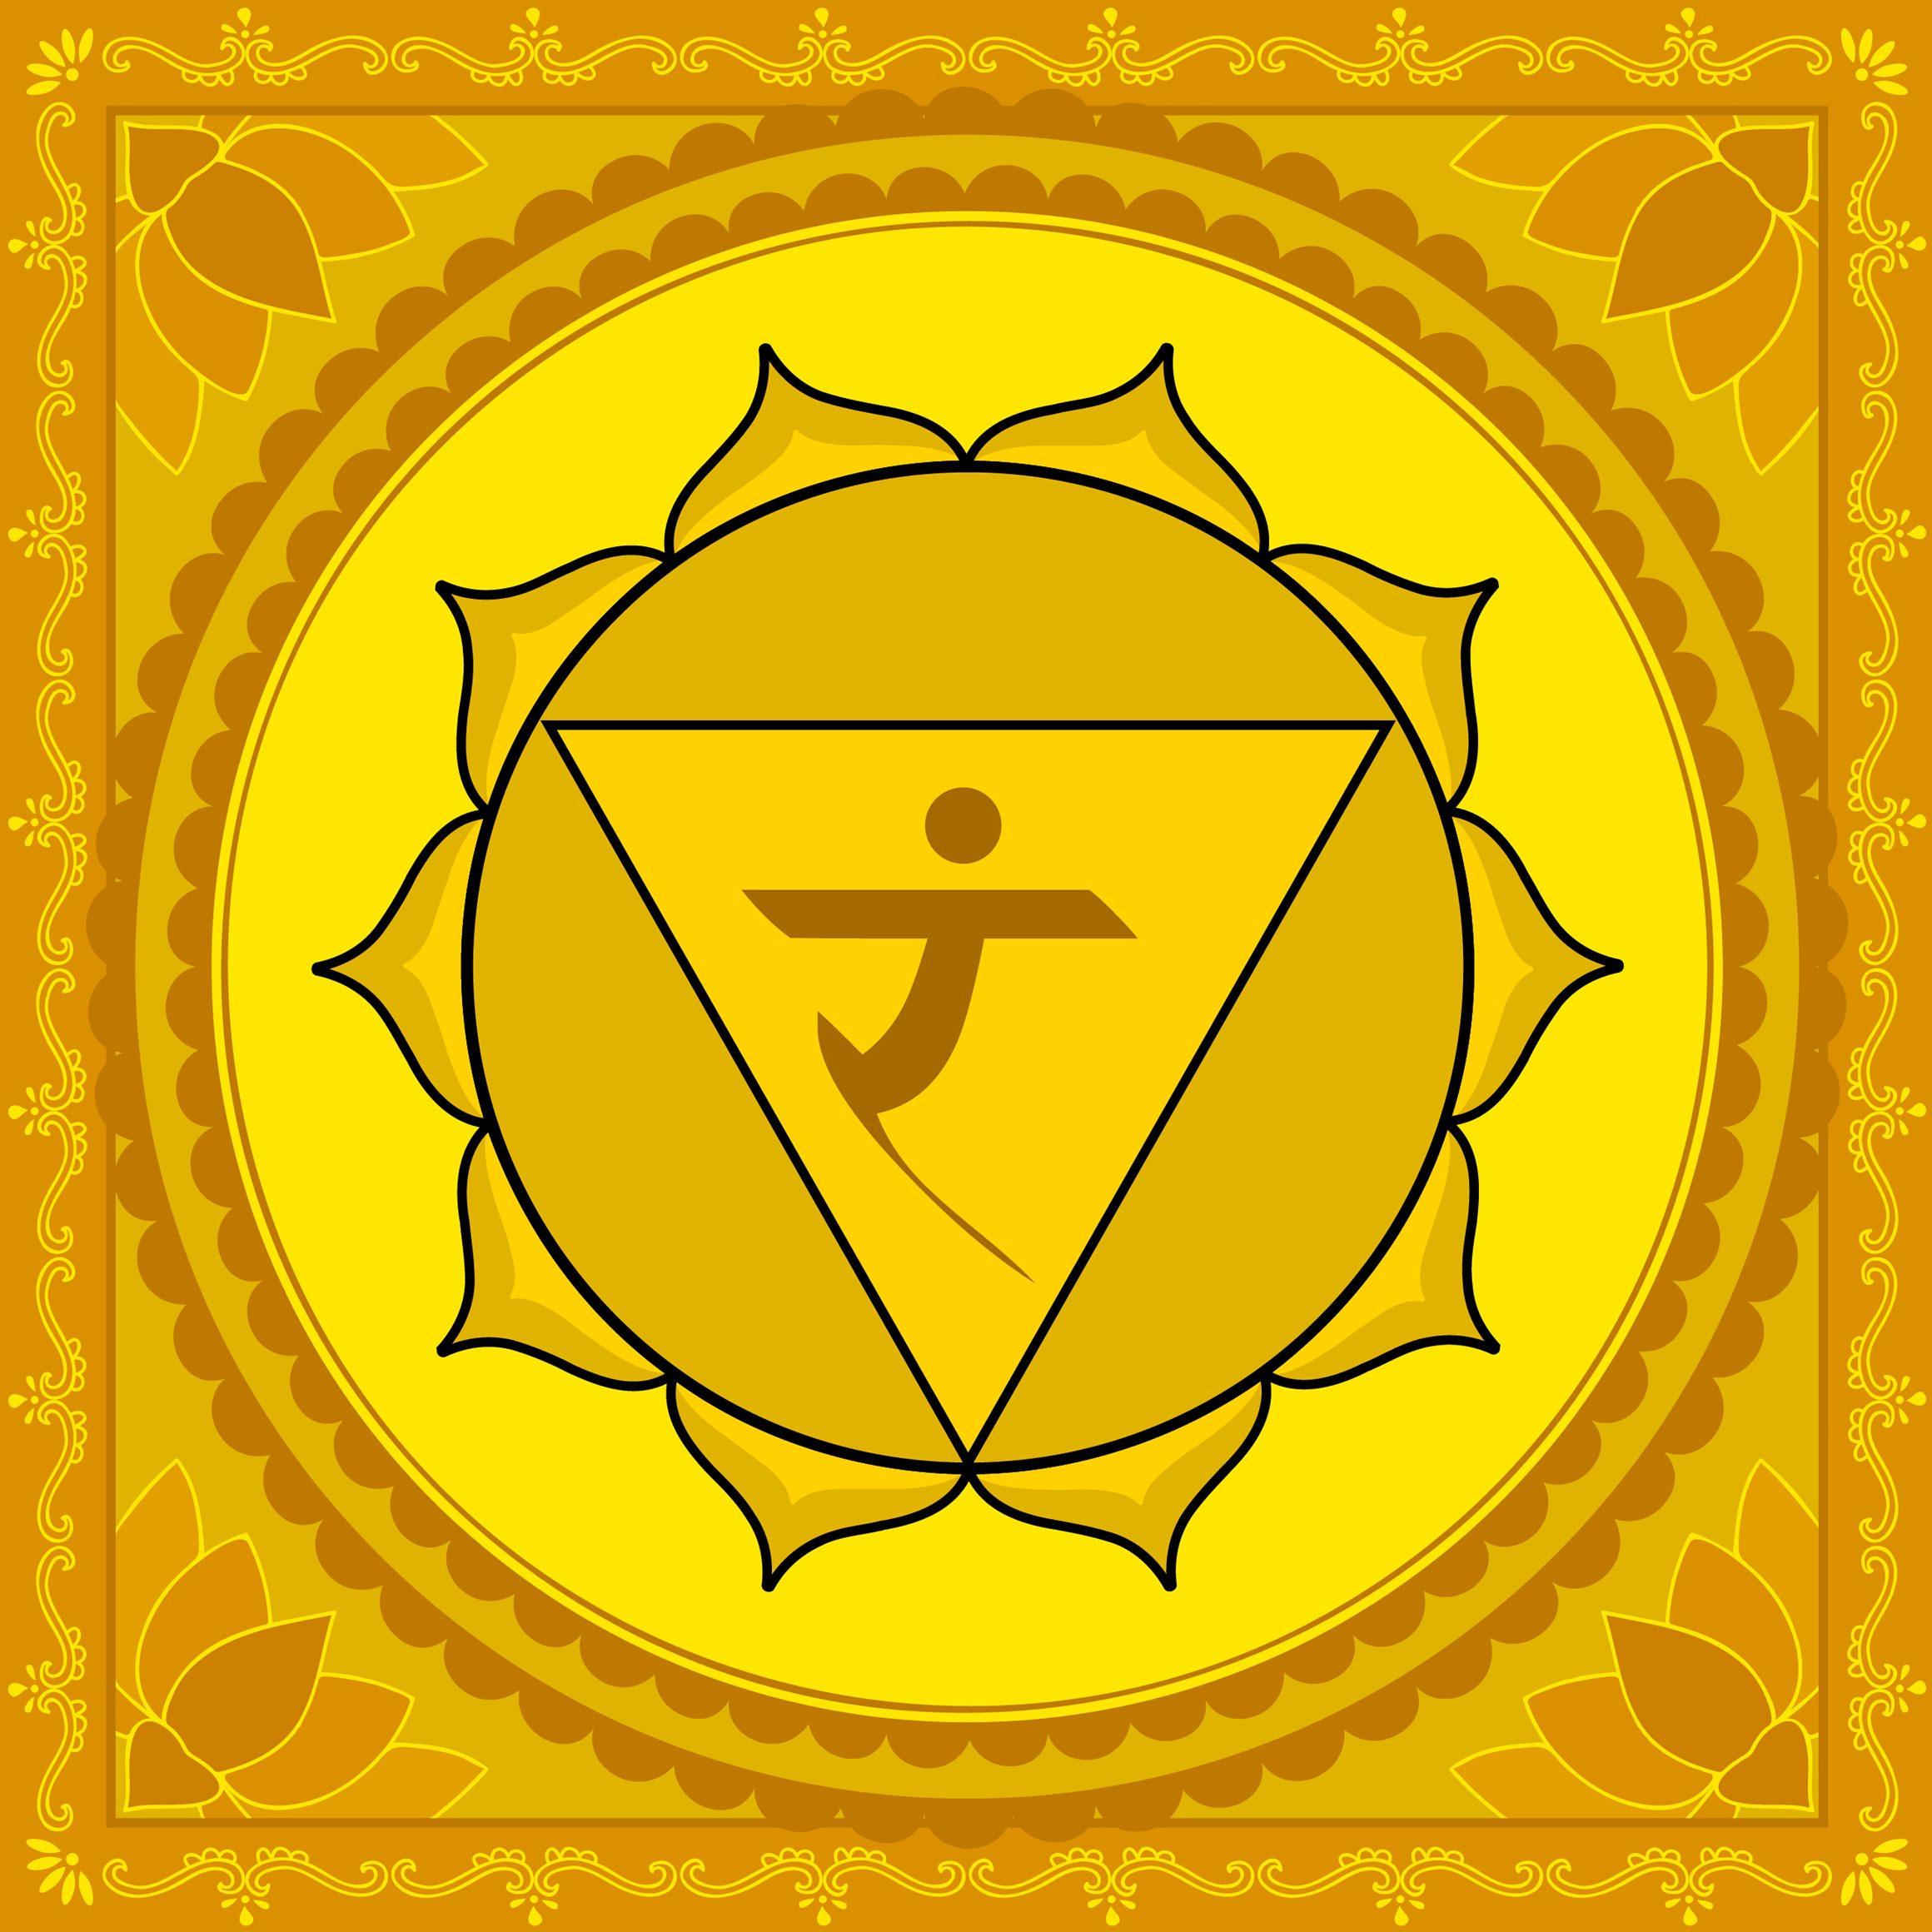 Healing the Chakras: Solar Plexus Chakra (Manipura)